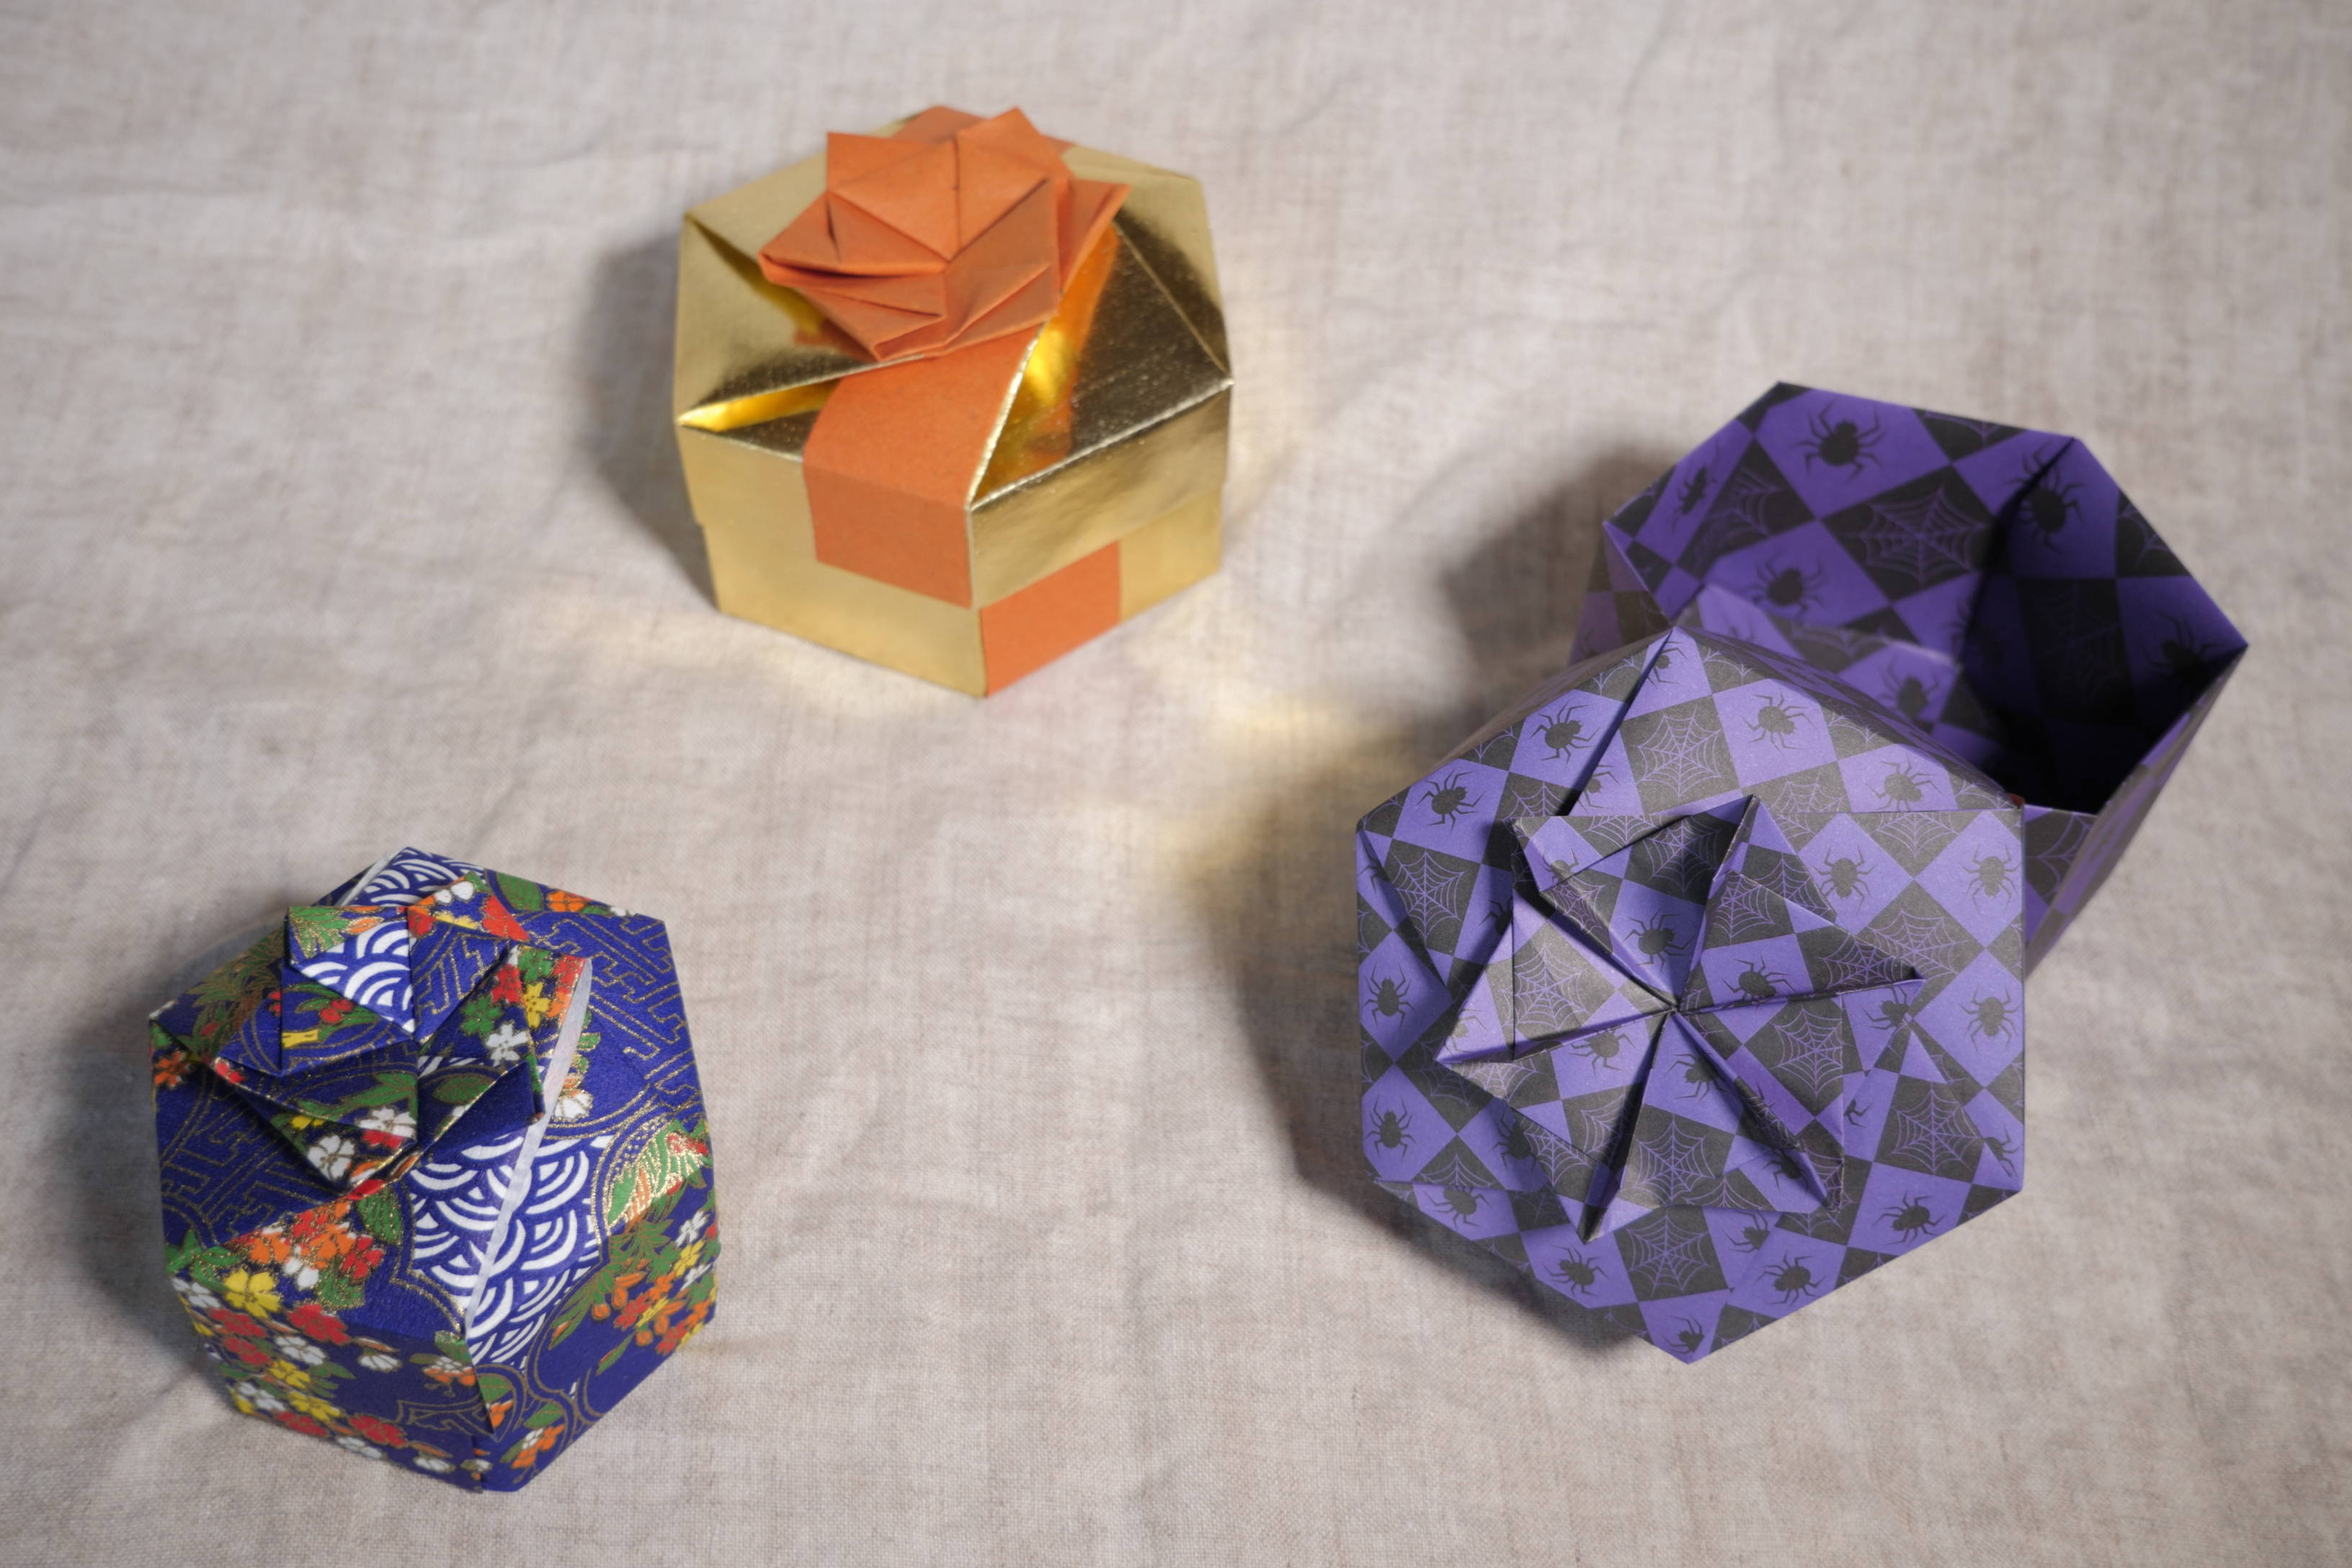 15cm 50 Sheets Square Christmas Metallic Foil Origami Paper